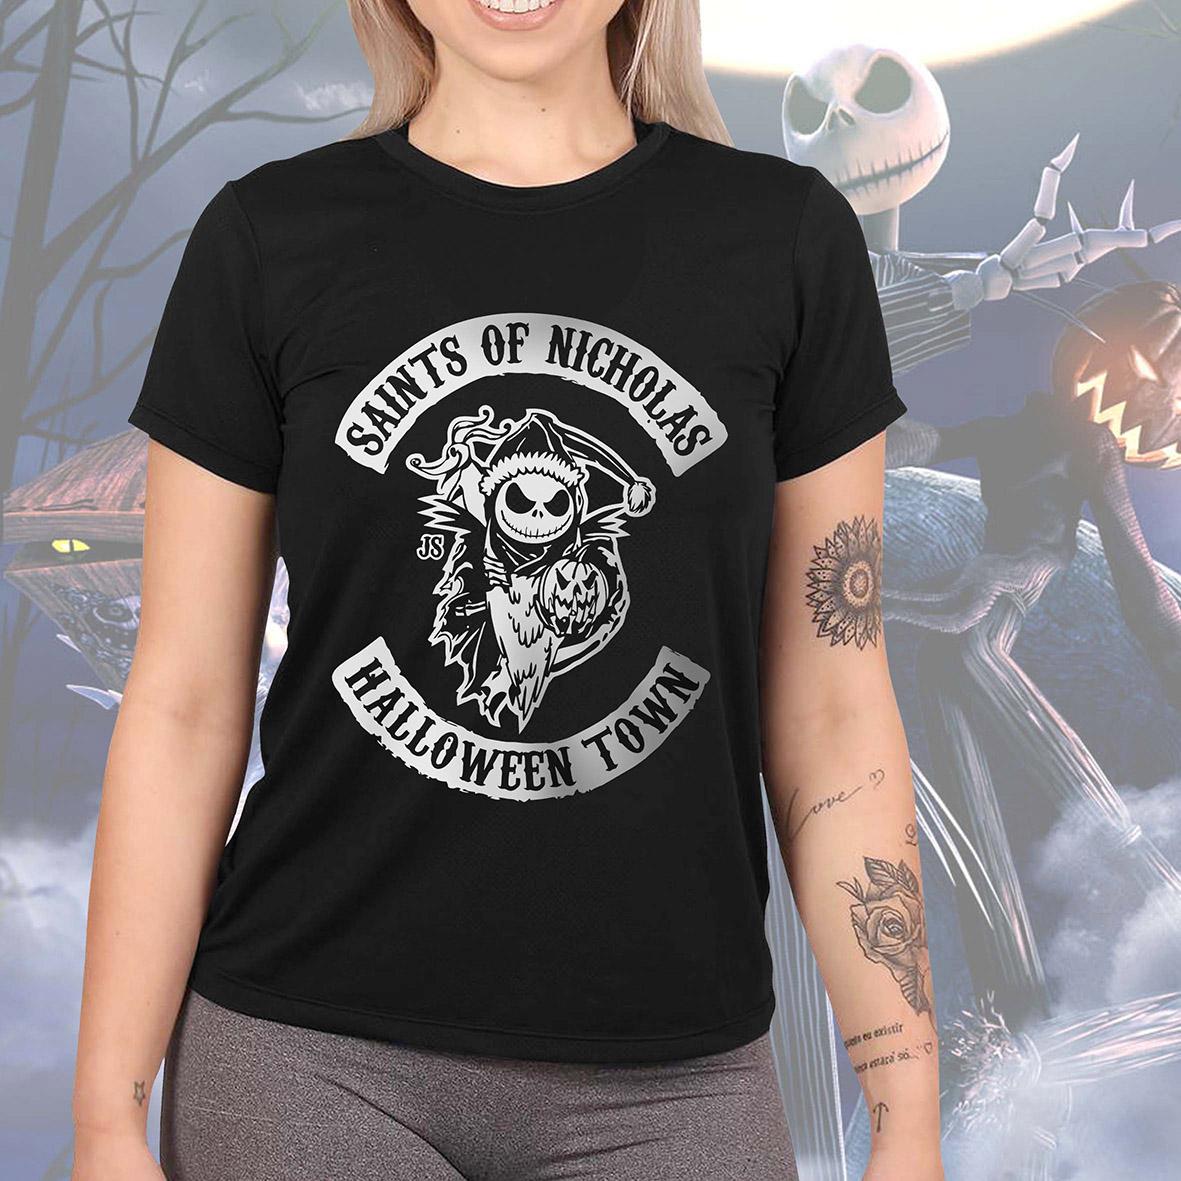 Camiseta Feminina Unissex Jack Skellington Tim Burton Saints Of Nicholas Halloween Town Sons Of Anarchy (Preta) - EV